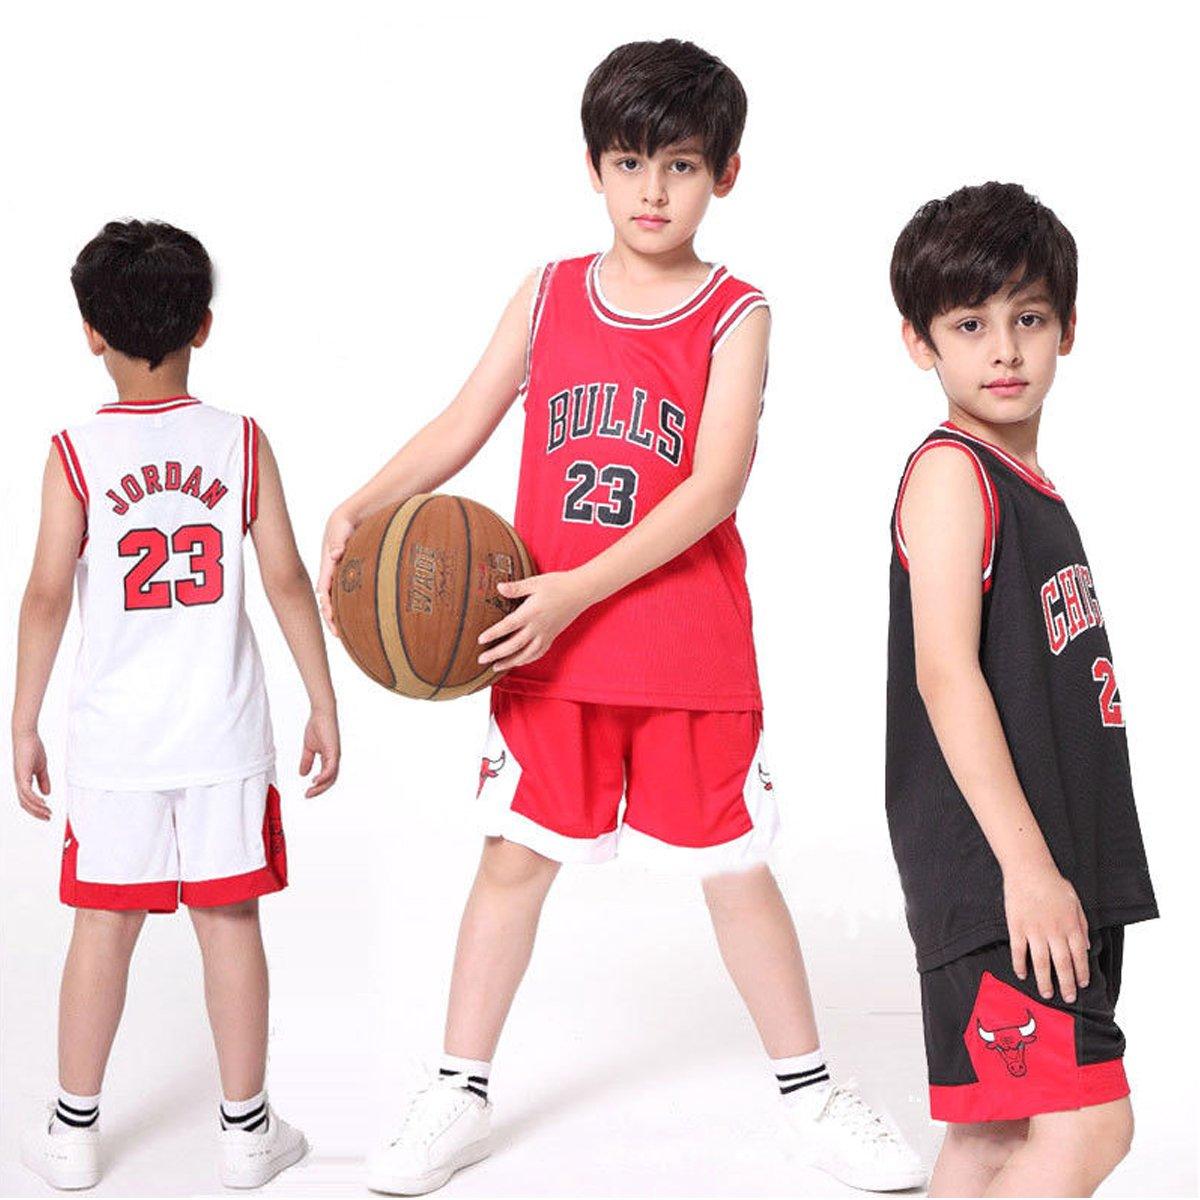 Kid Boy Mens NBA Michael Jordan  23 Chicago Bulls RETRO Basketball shorts  Summer Jerseys Basketball Uniform Top Short  Amazon.co.uk  Sports   Outdoors 87ff6a257ab